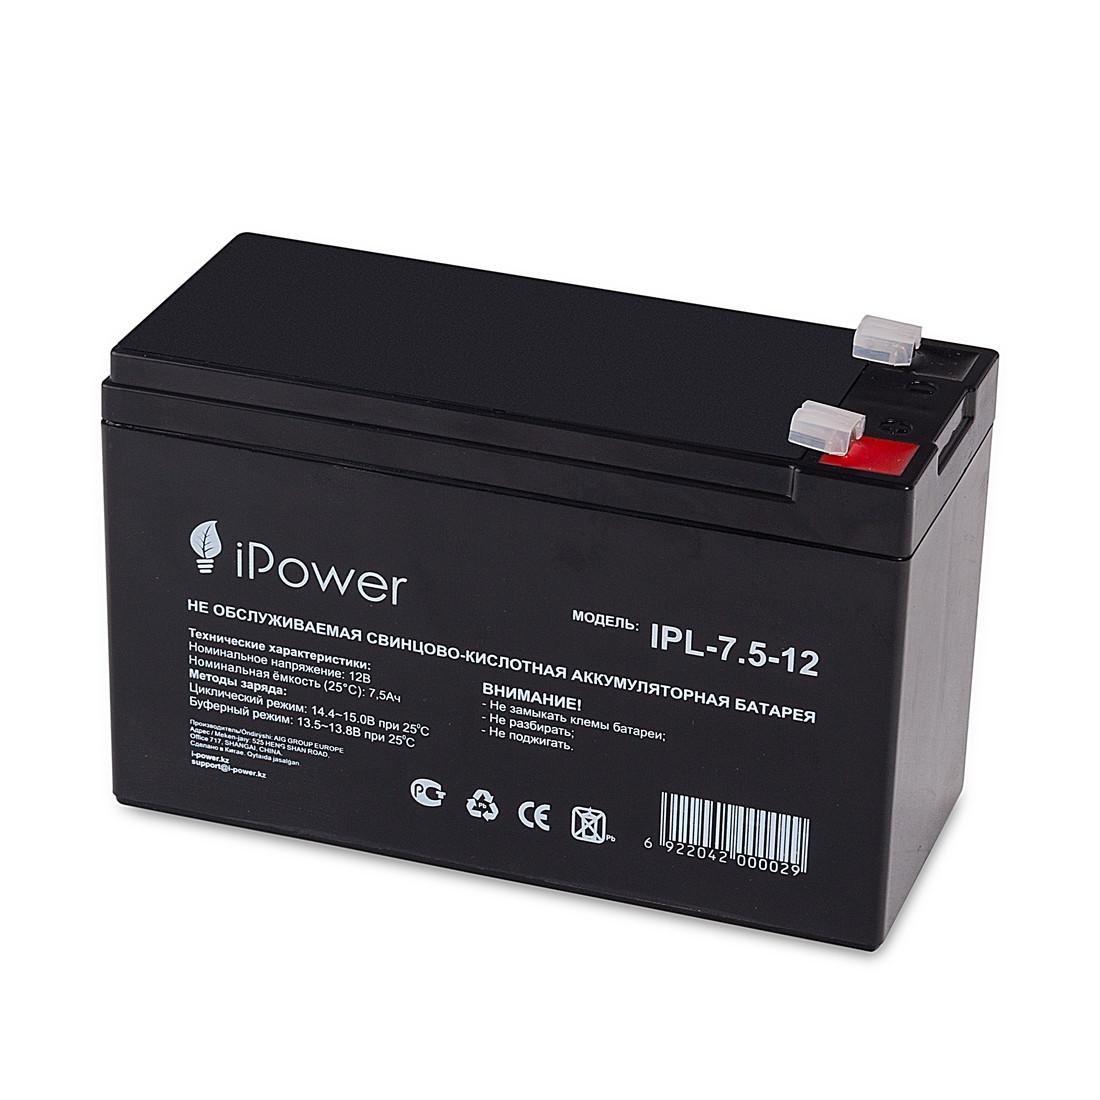 Батарея свинцово-кислотная IPower IPL7.5-12 (12В, 7.5 Ач)